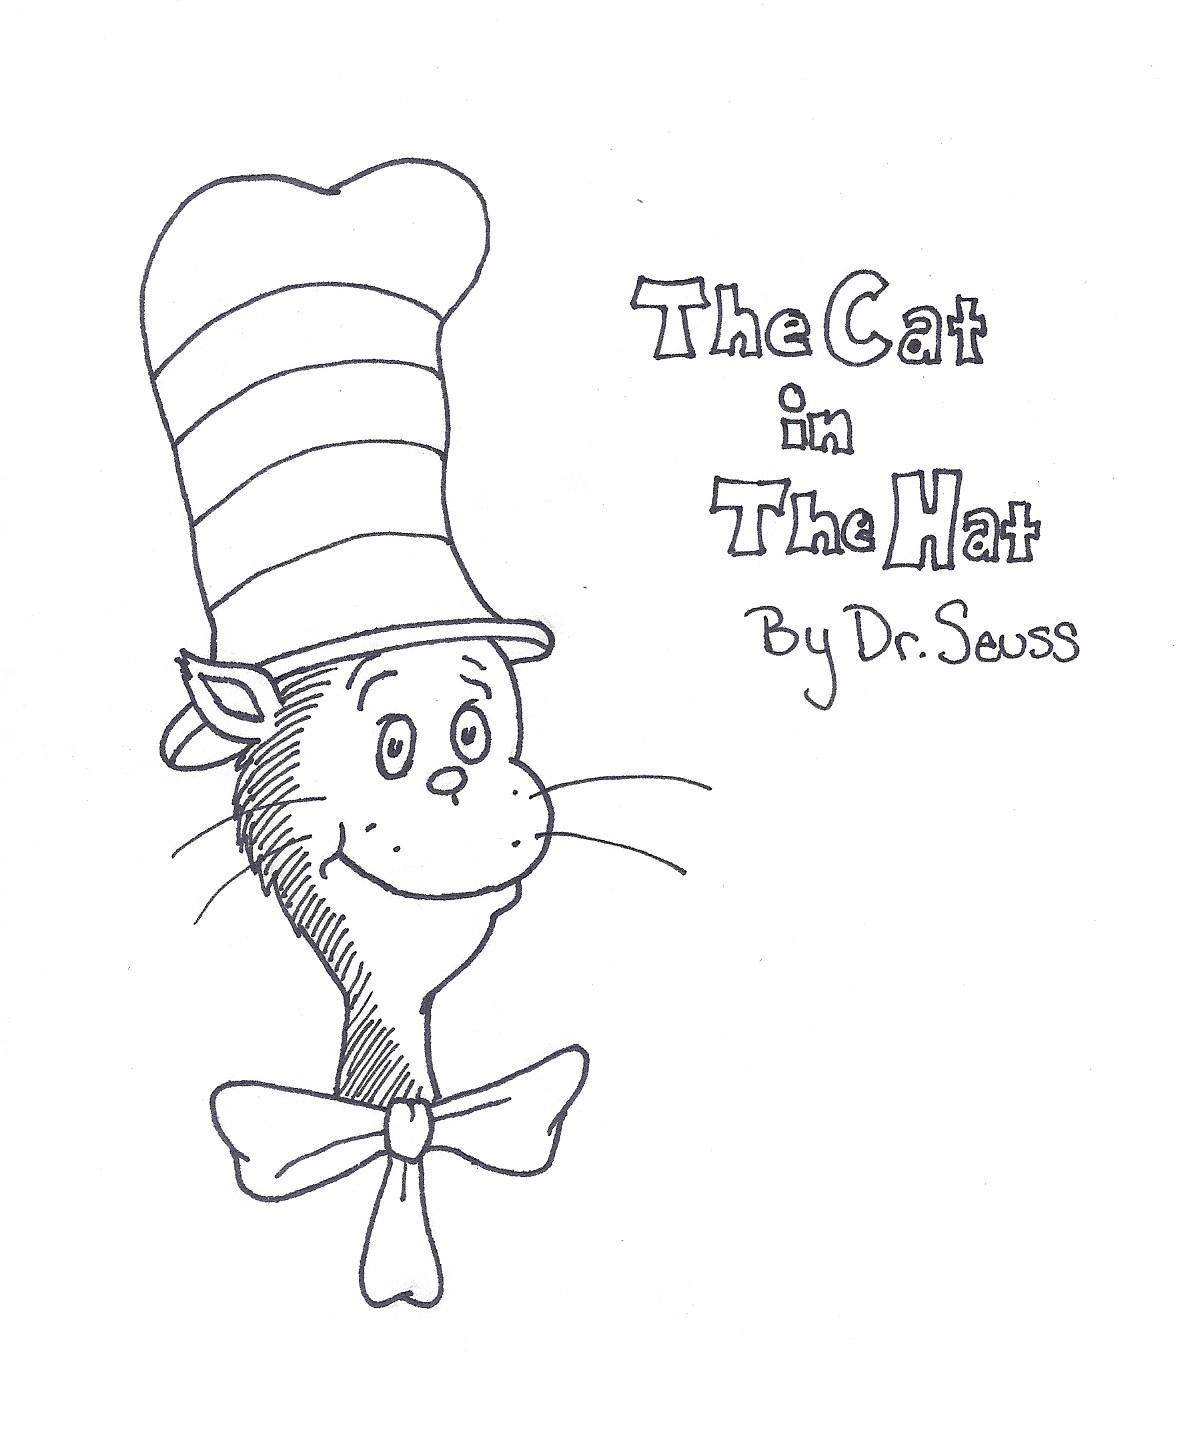 Dr Seuss Coloring Pages For Kids  Dr Seuss Printable Coloring Pages